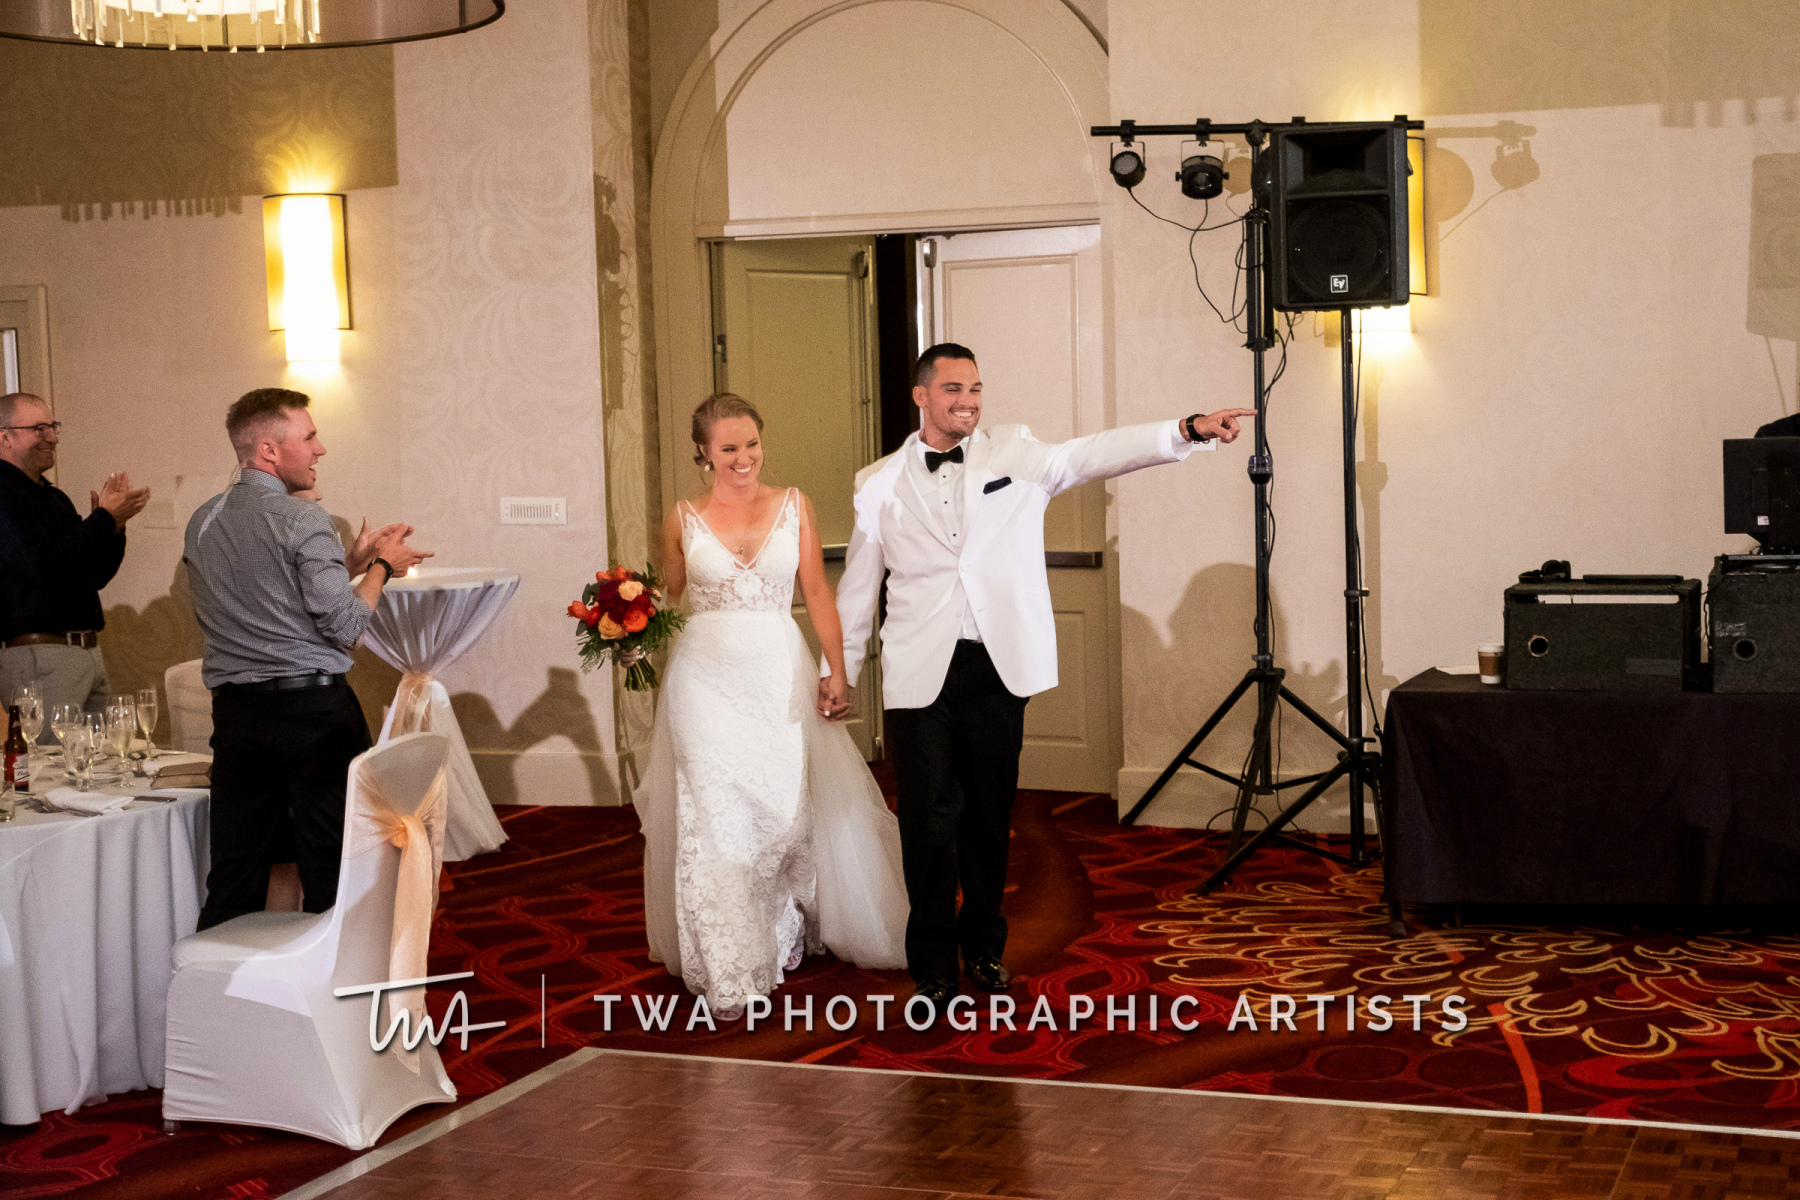 Chicago-Wedding-Photographers-Renaissance-Hotel_Hohensee_Fleishman_JG_DK-072-0476